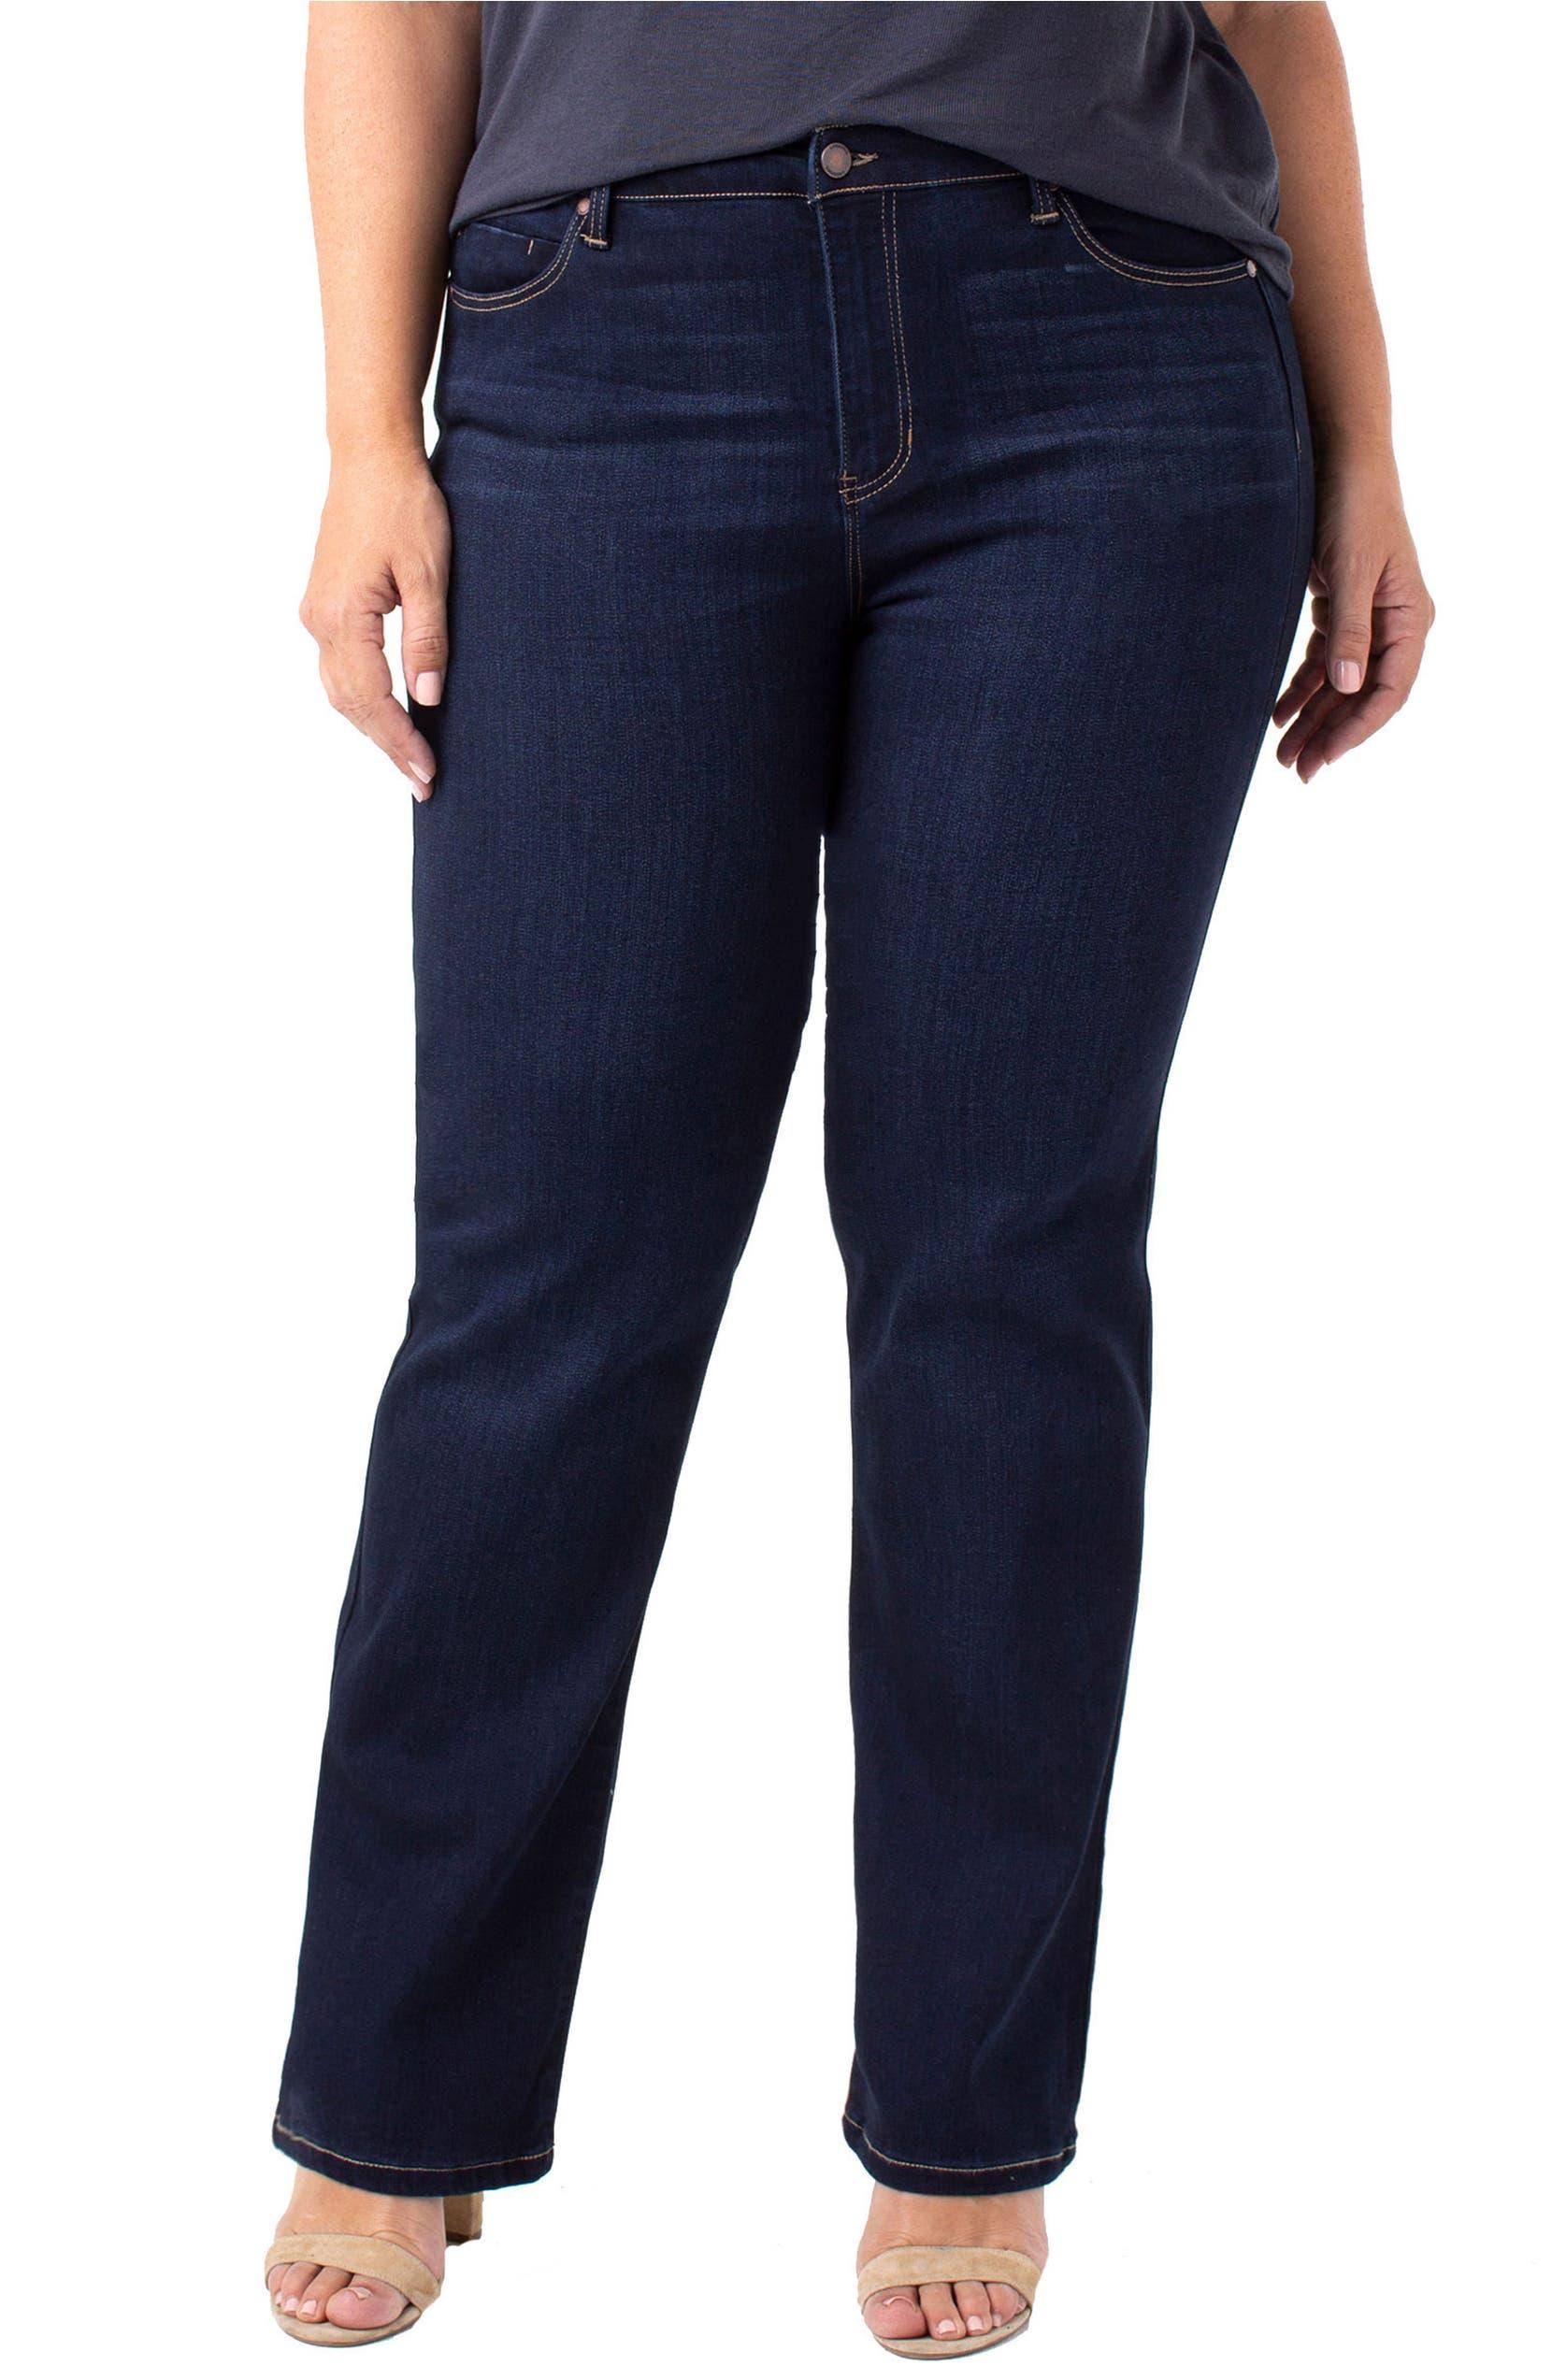 0eedbd431be85 Liverpool Sadie Straight Leg Jeans (Plus Size)